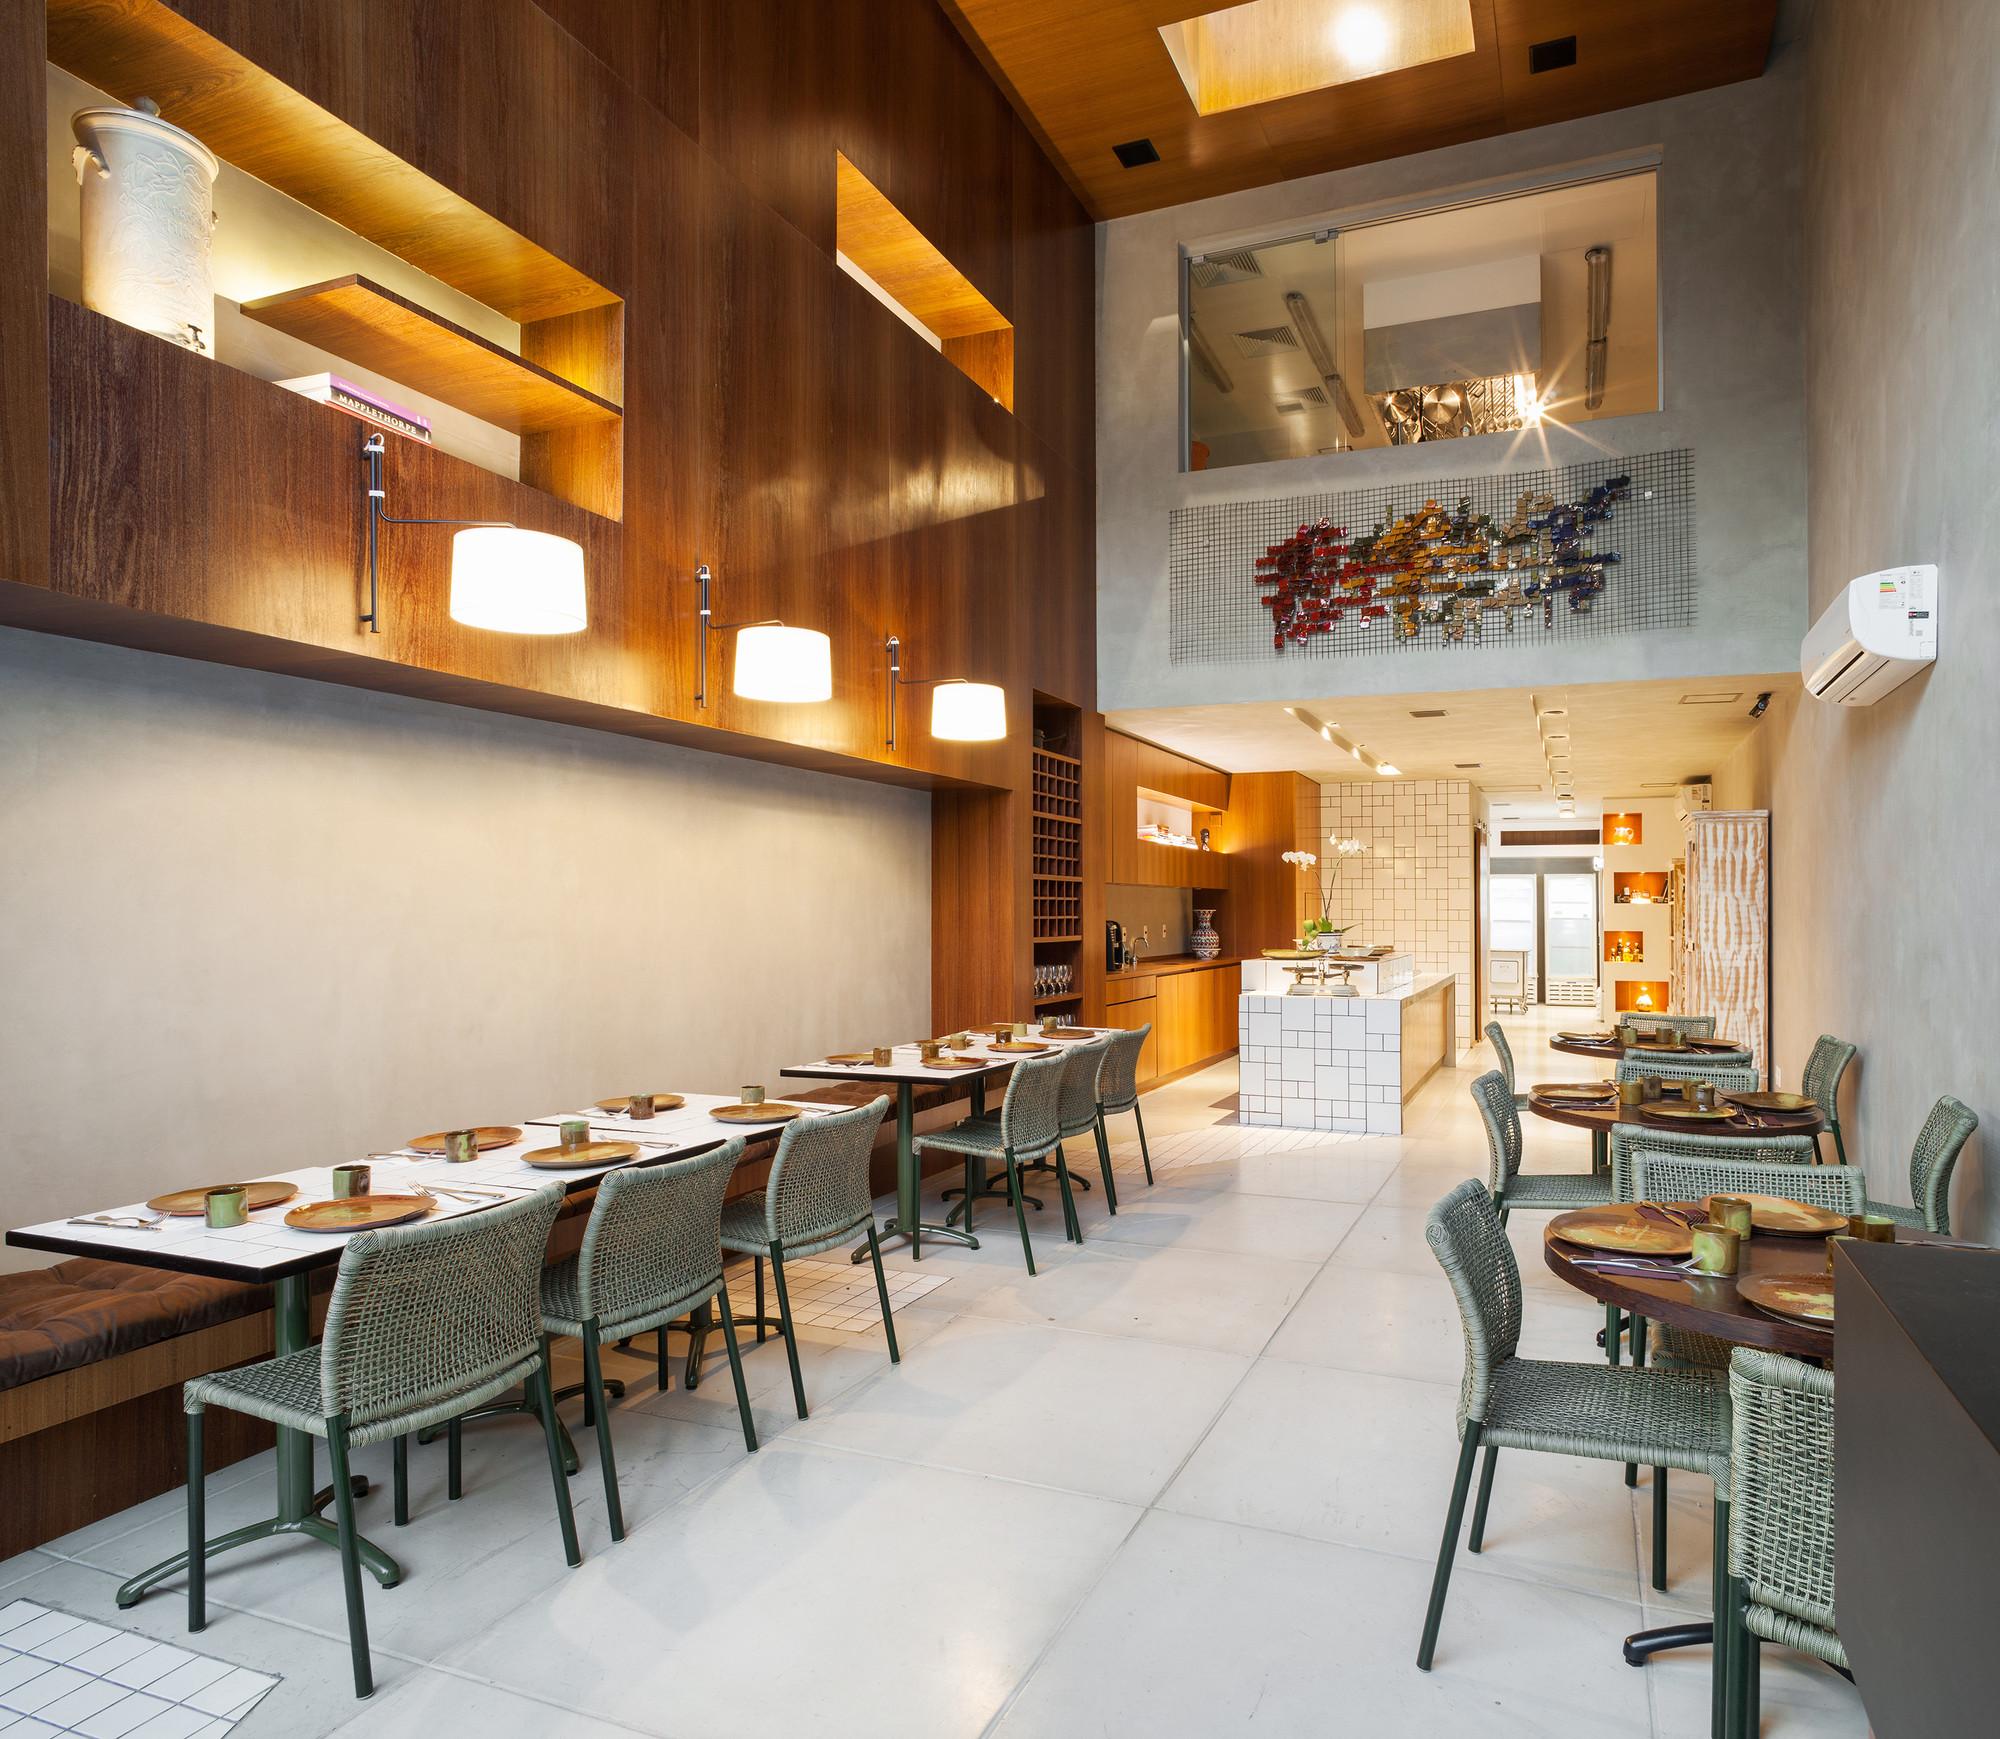 Guilhermina Restaurant / FGMF Arquitetos, © Rafaela Netto